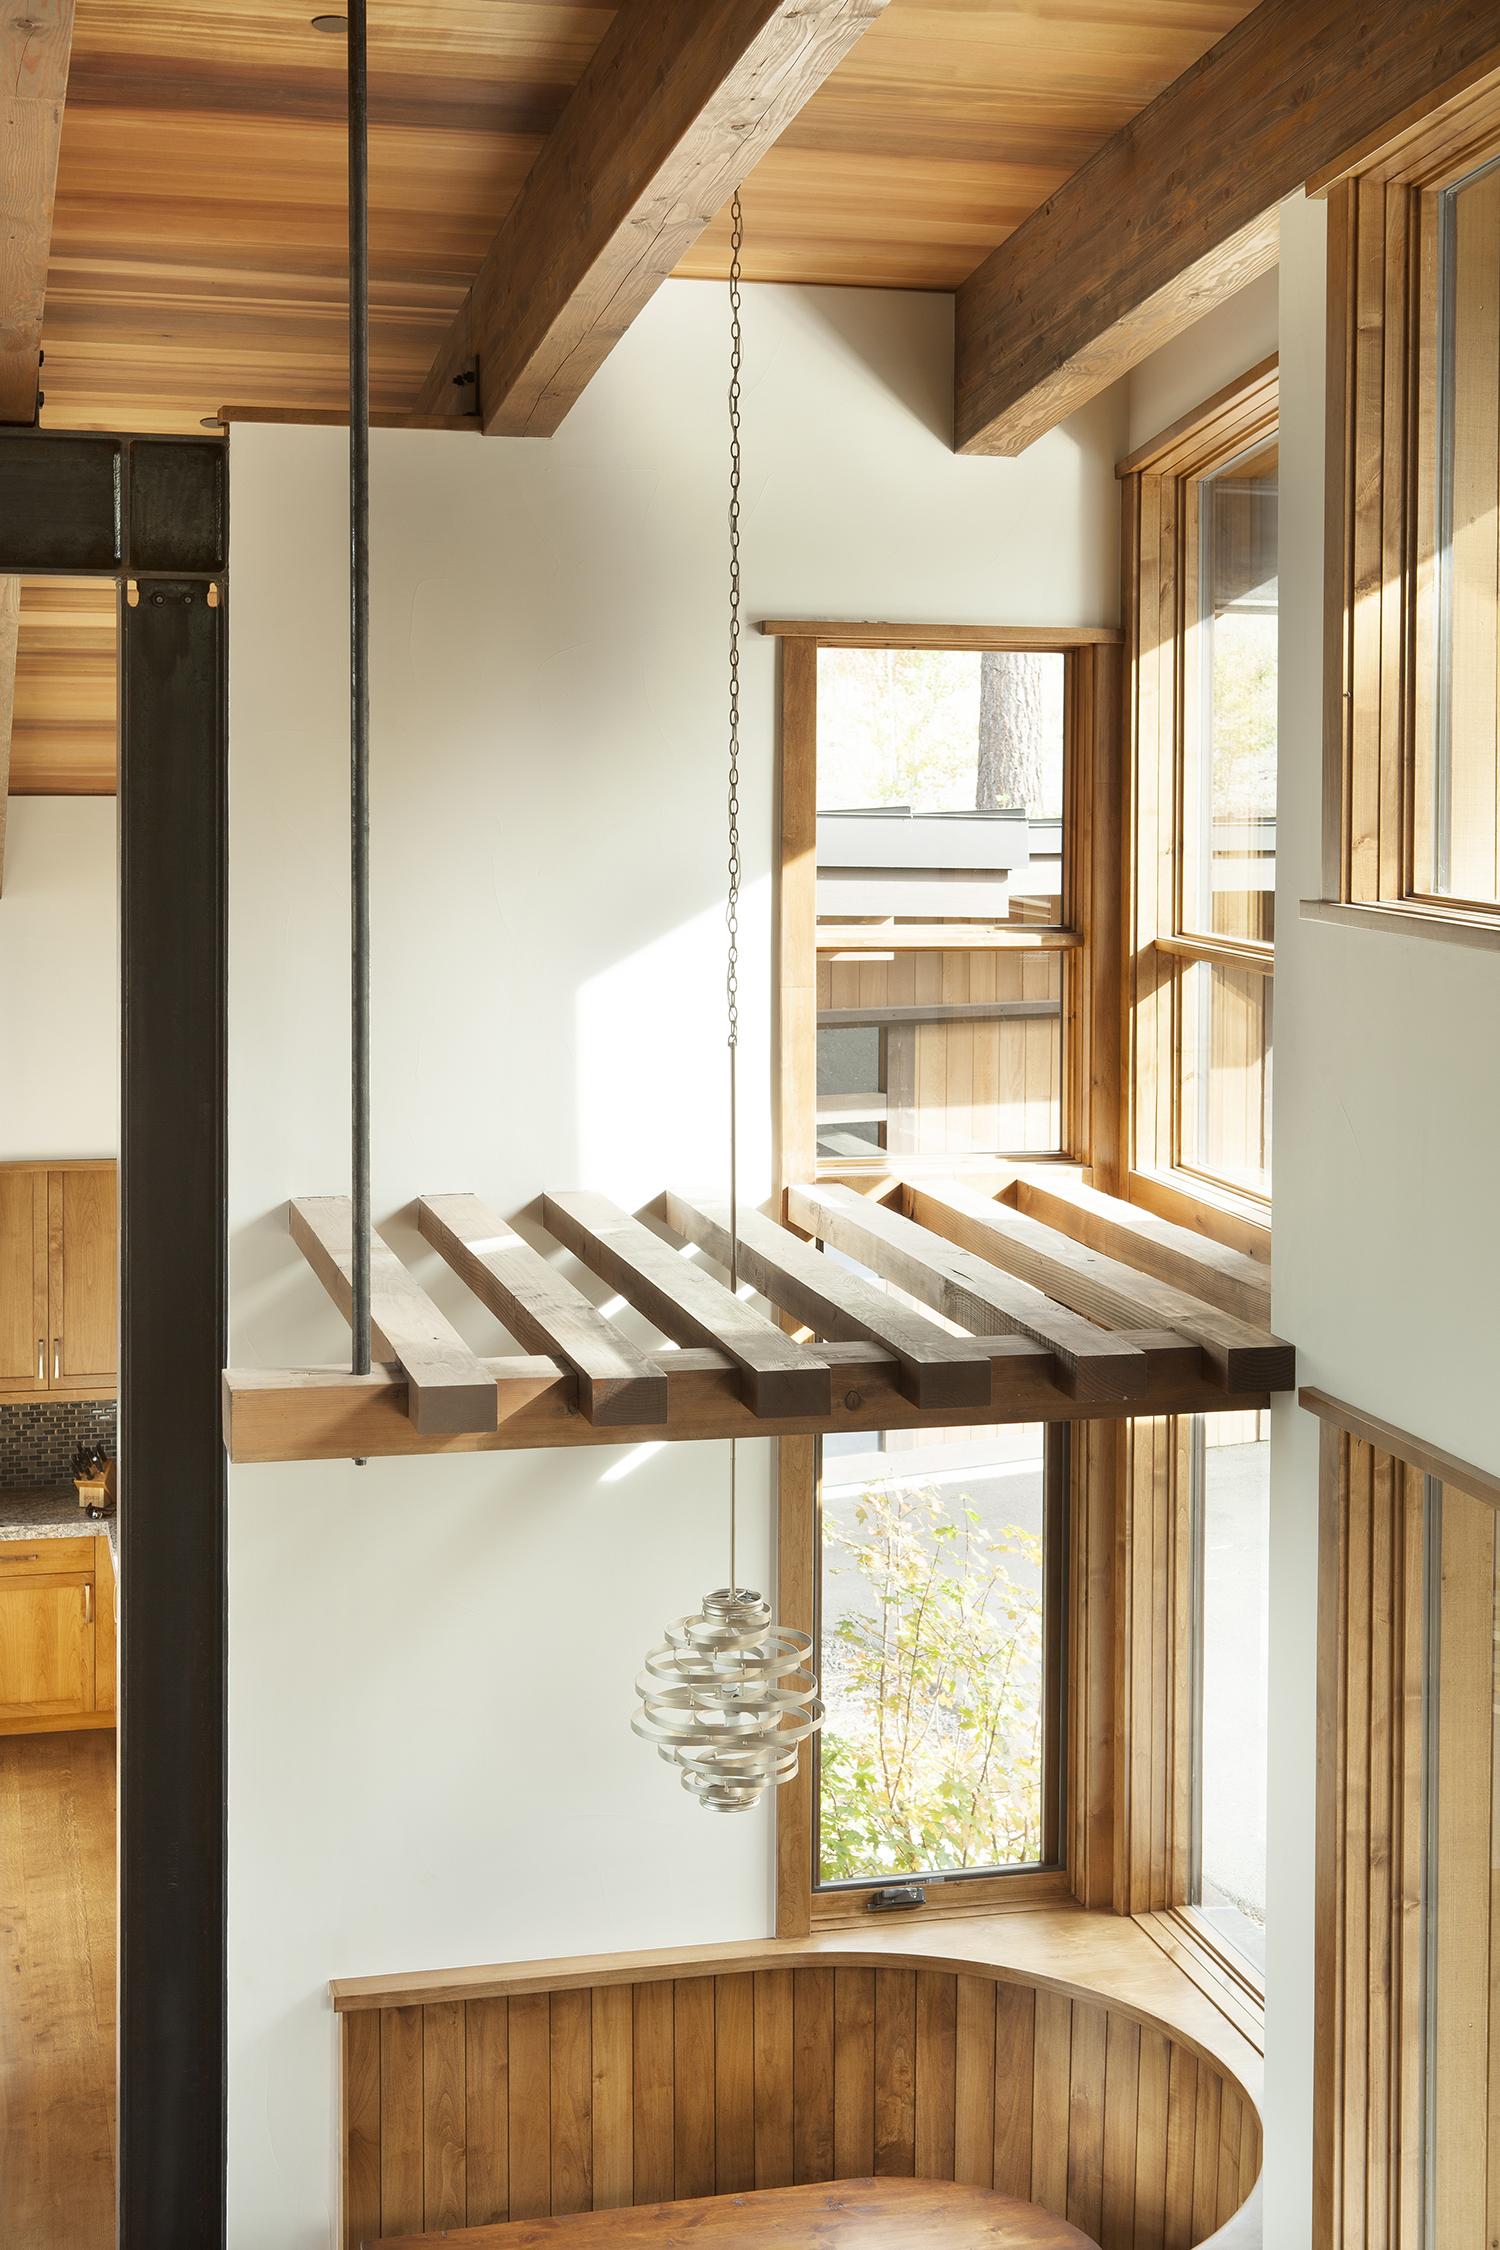 Lot 483_Stairwell View_Detail.jpg